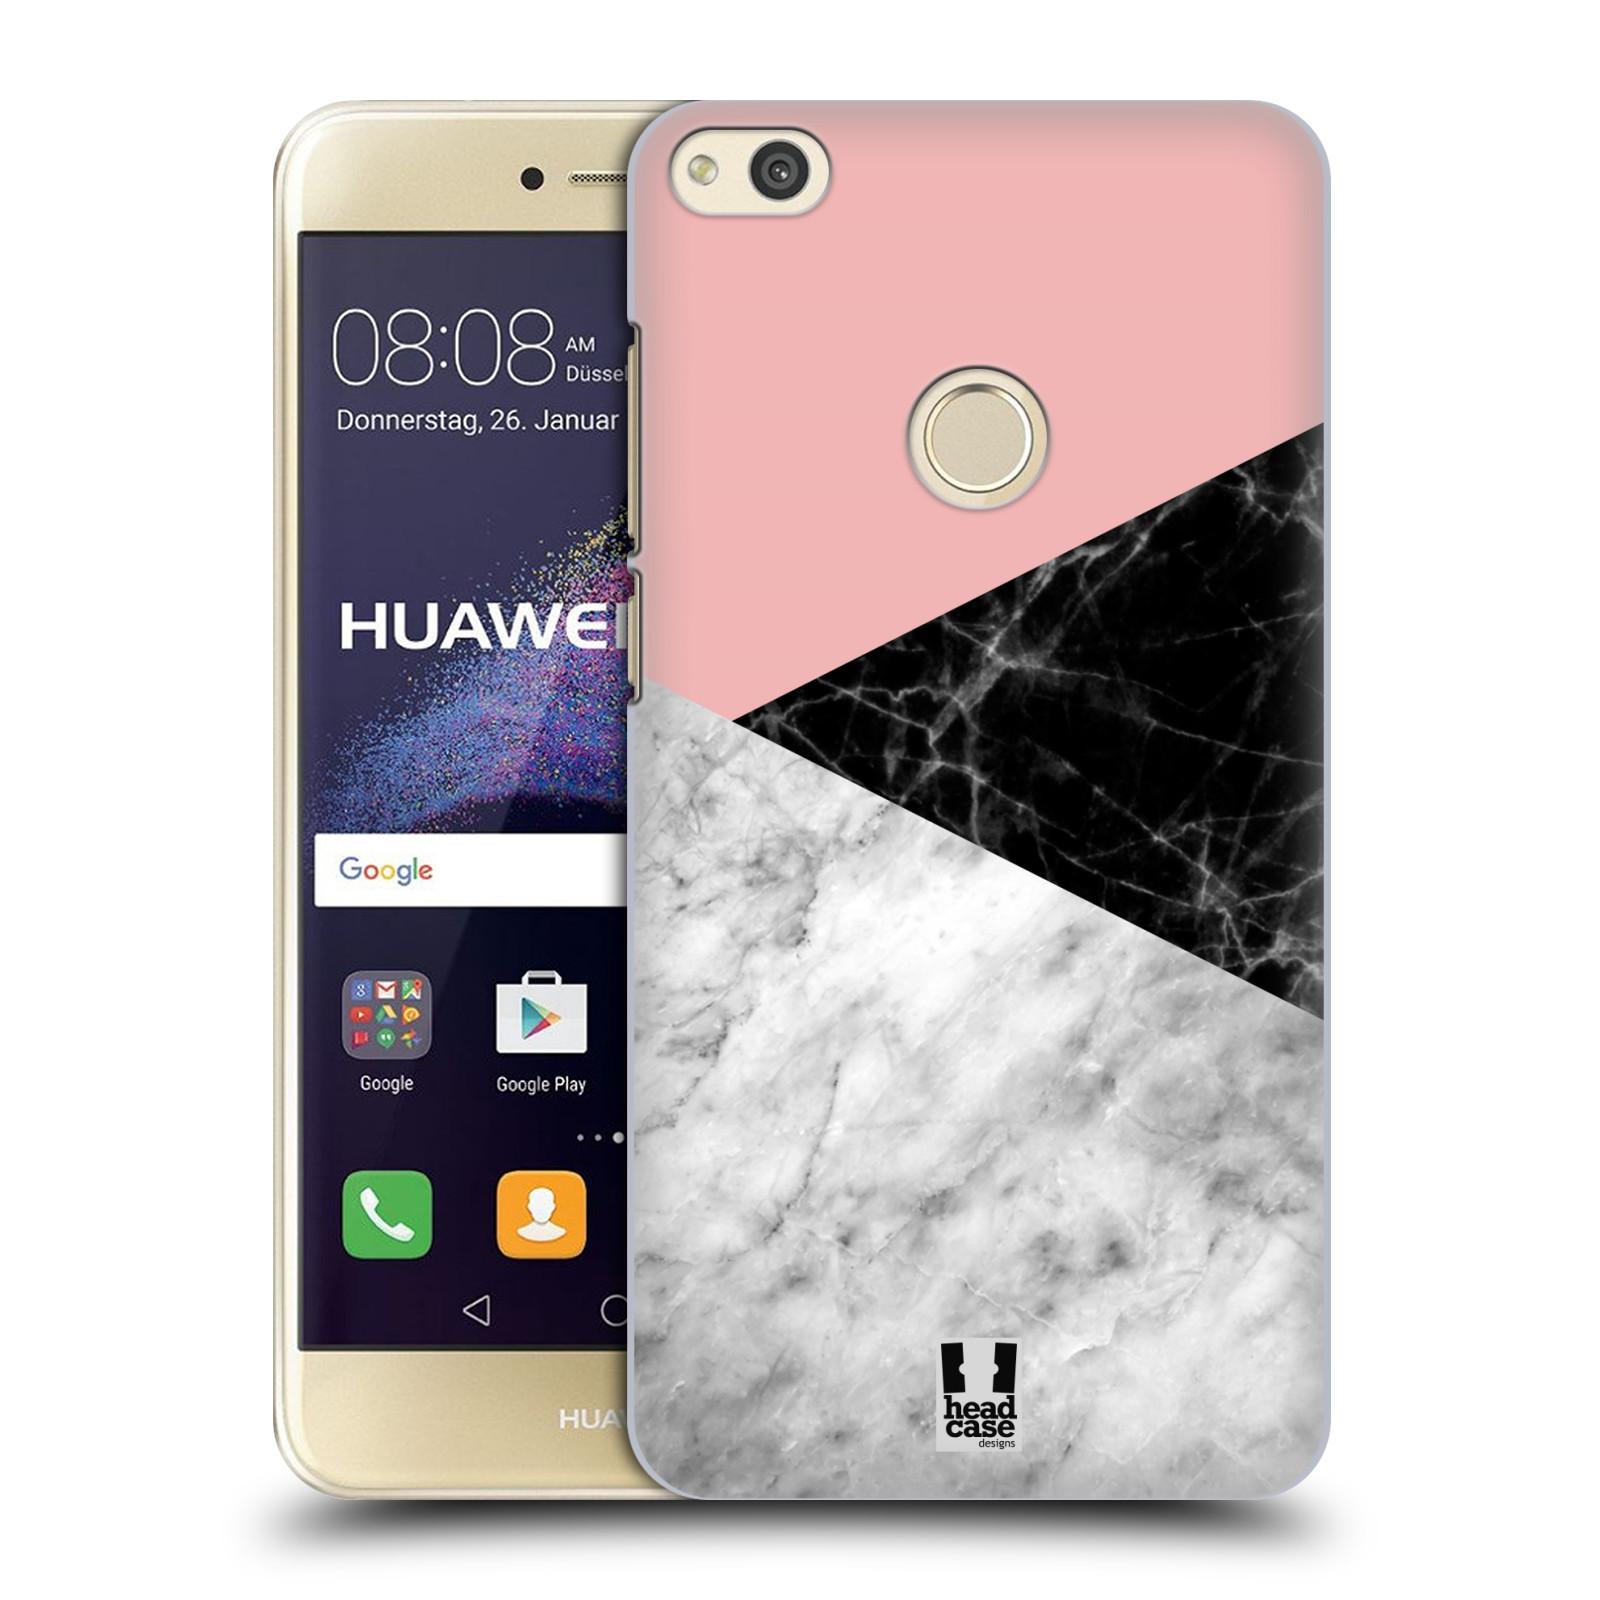 Plastové pouzdro na mobil Huawei P9 Lite (2017) - Head Case - Mramor mix